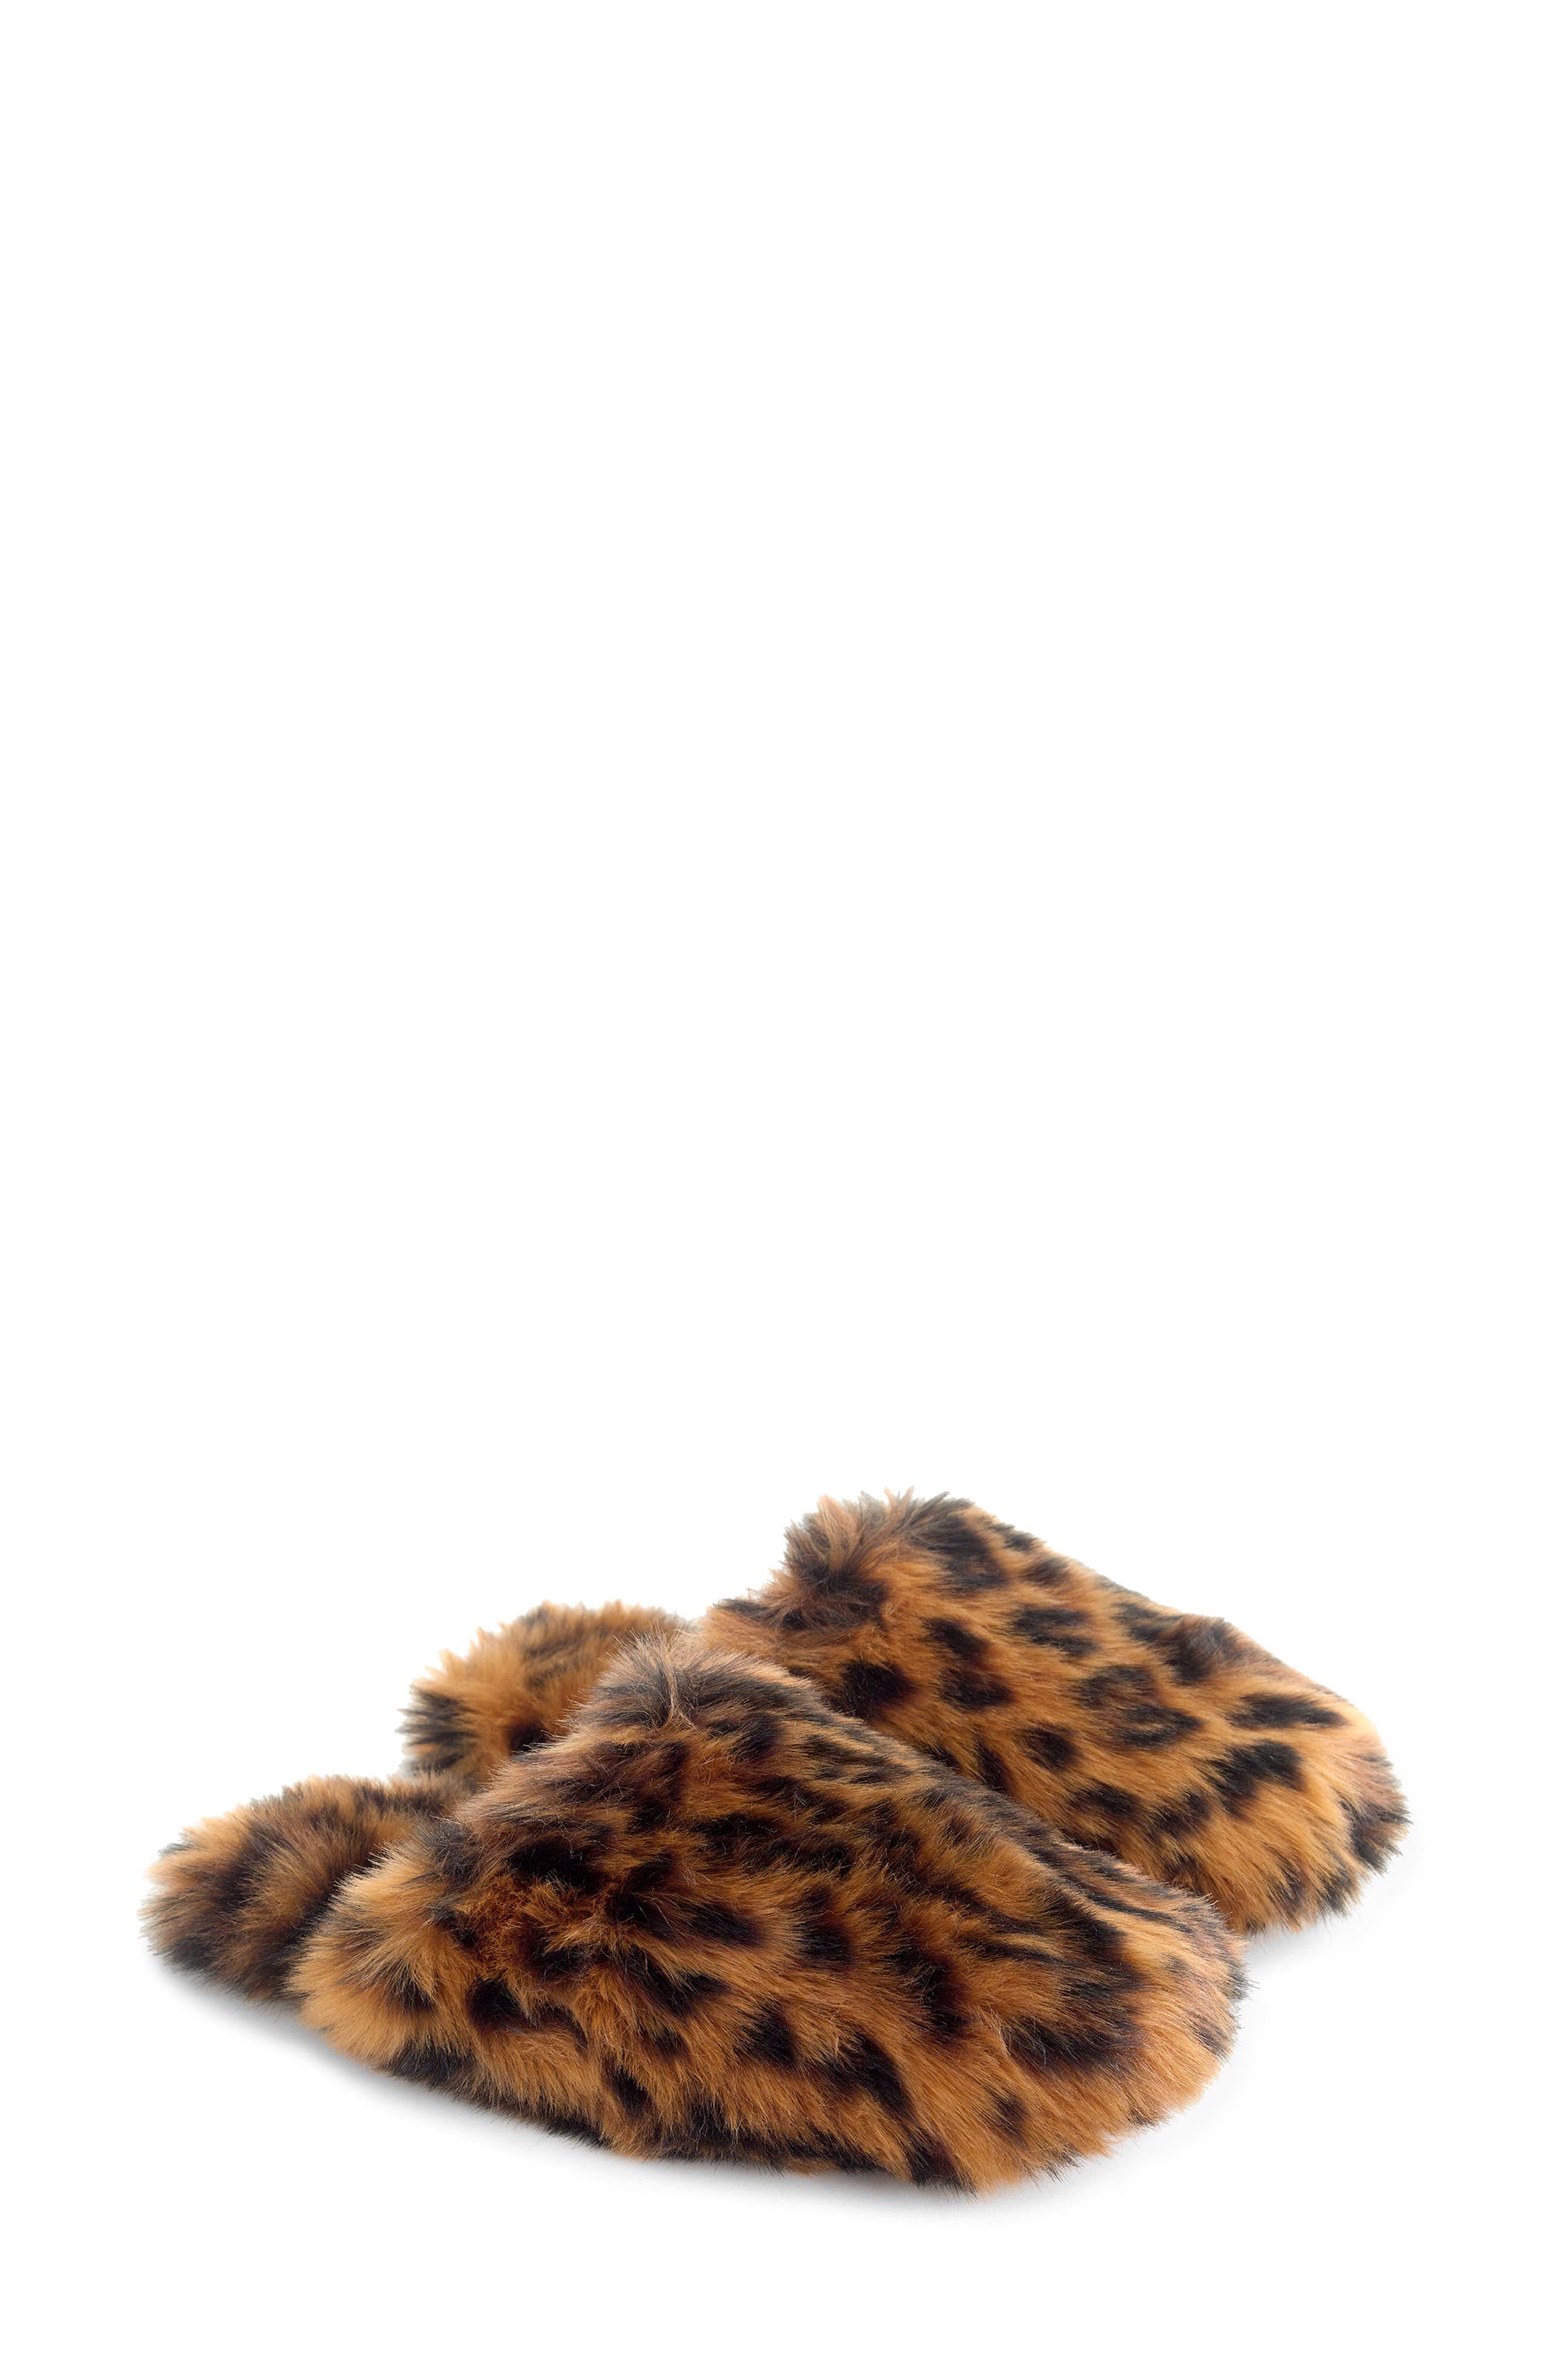 J.CREW Faux Fur Slipper, Main, color, 200